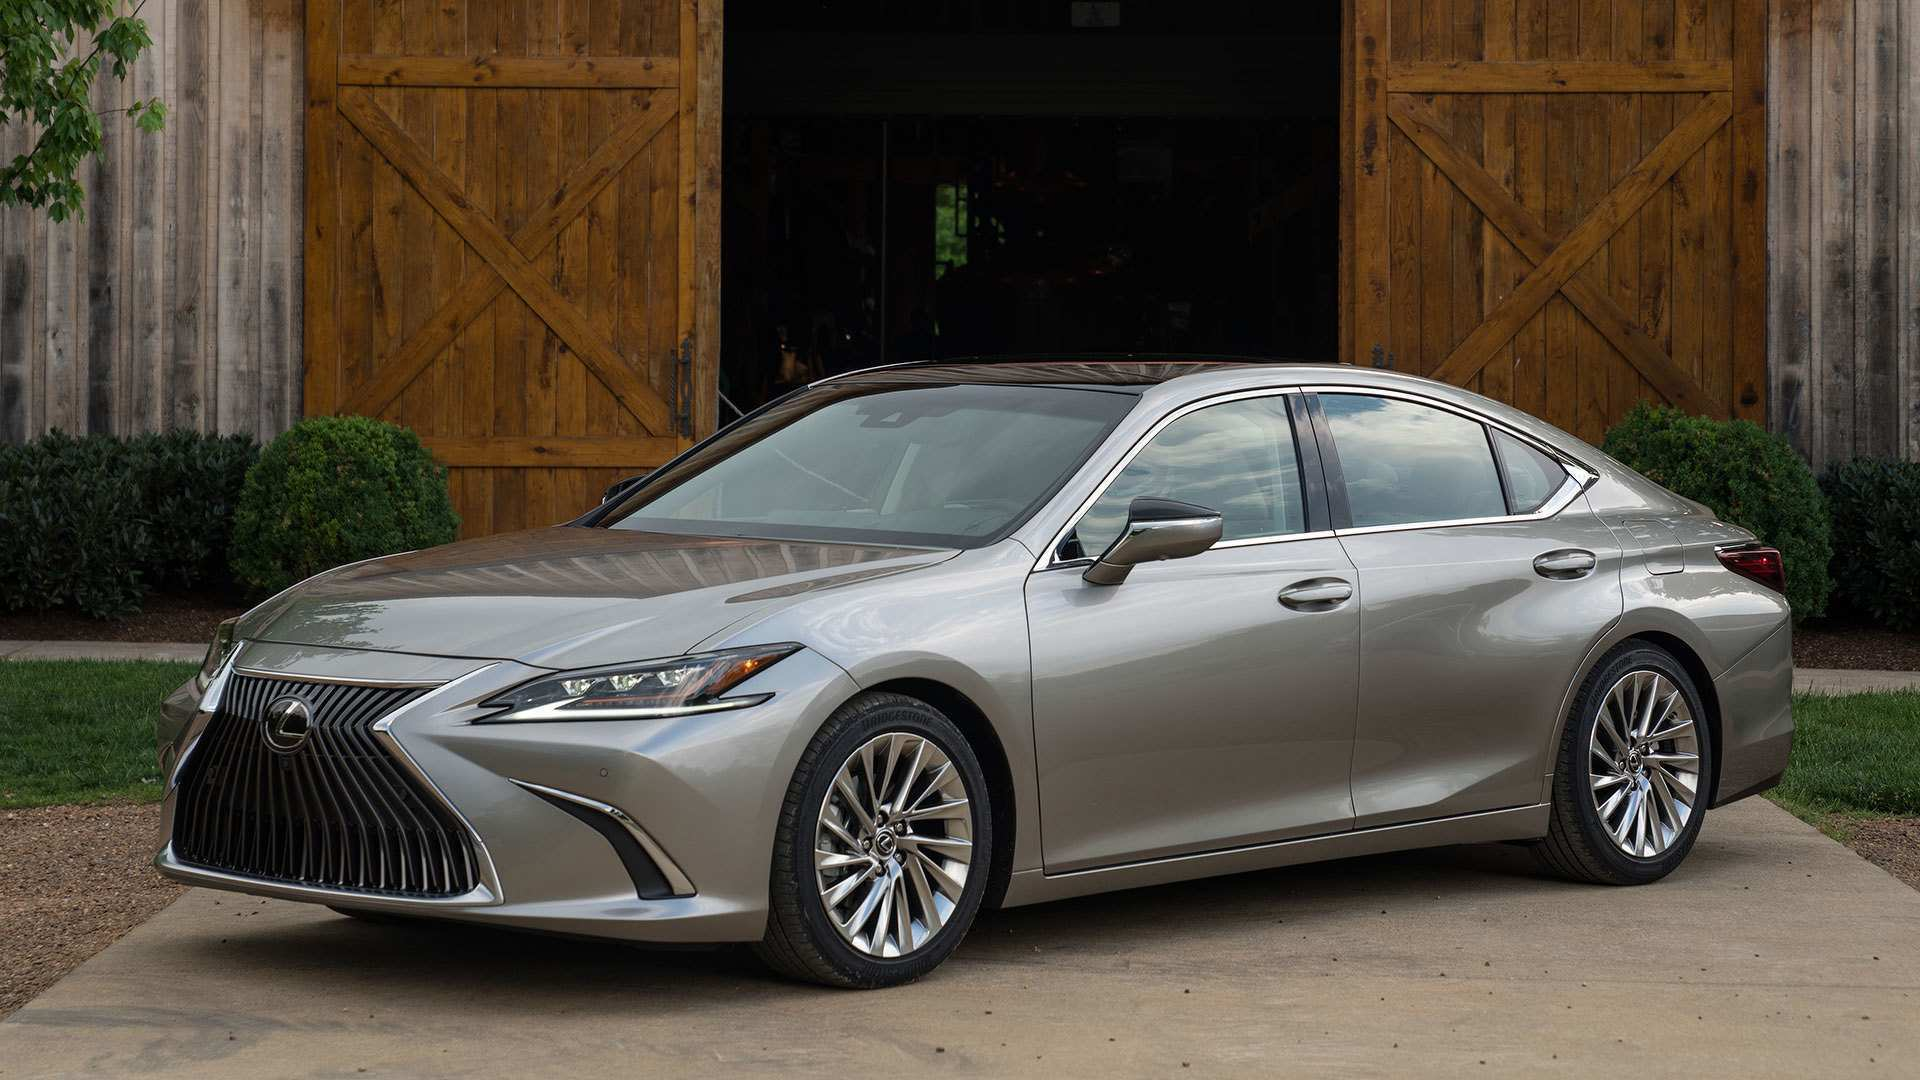 57 All New 2019 Lexus 350 Es Pictures by 2019 Lexus 350 Es